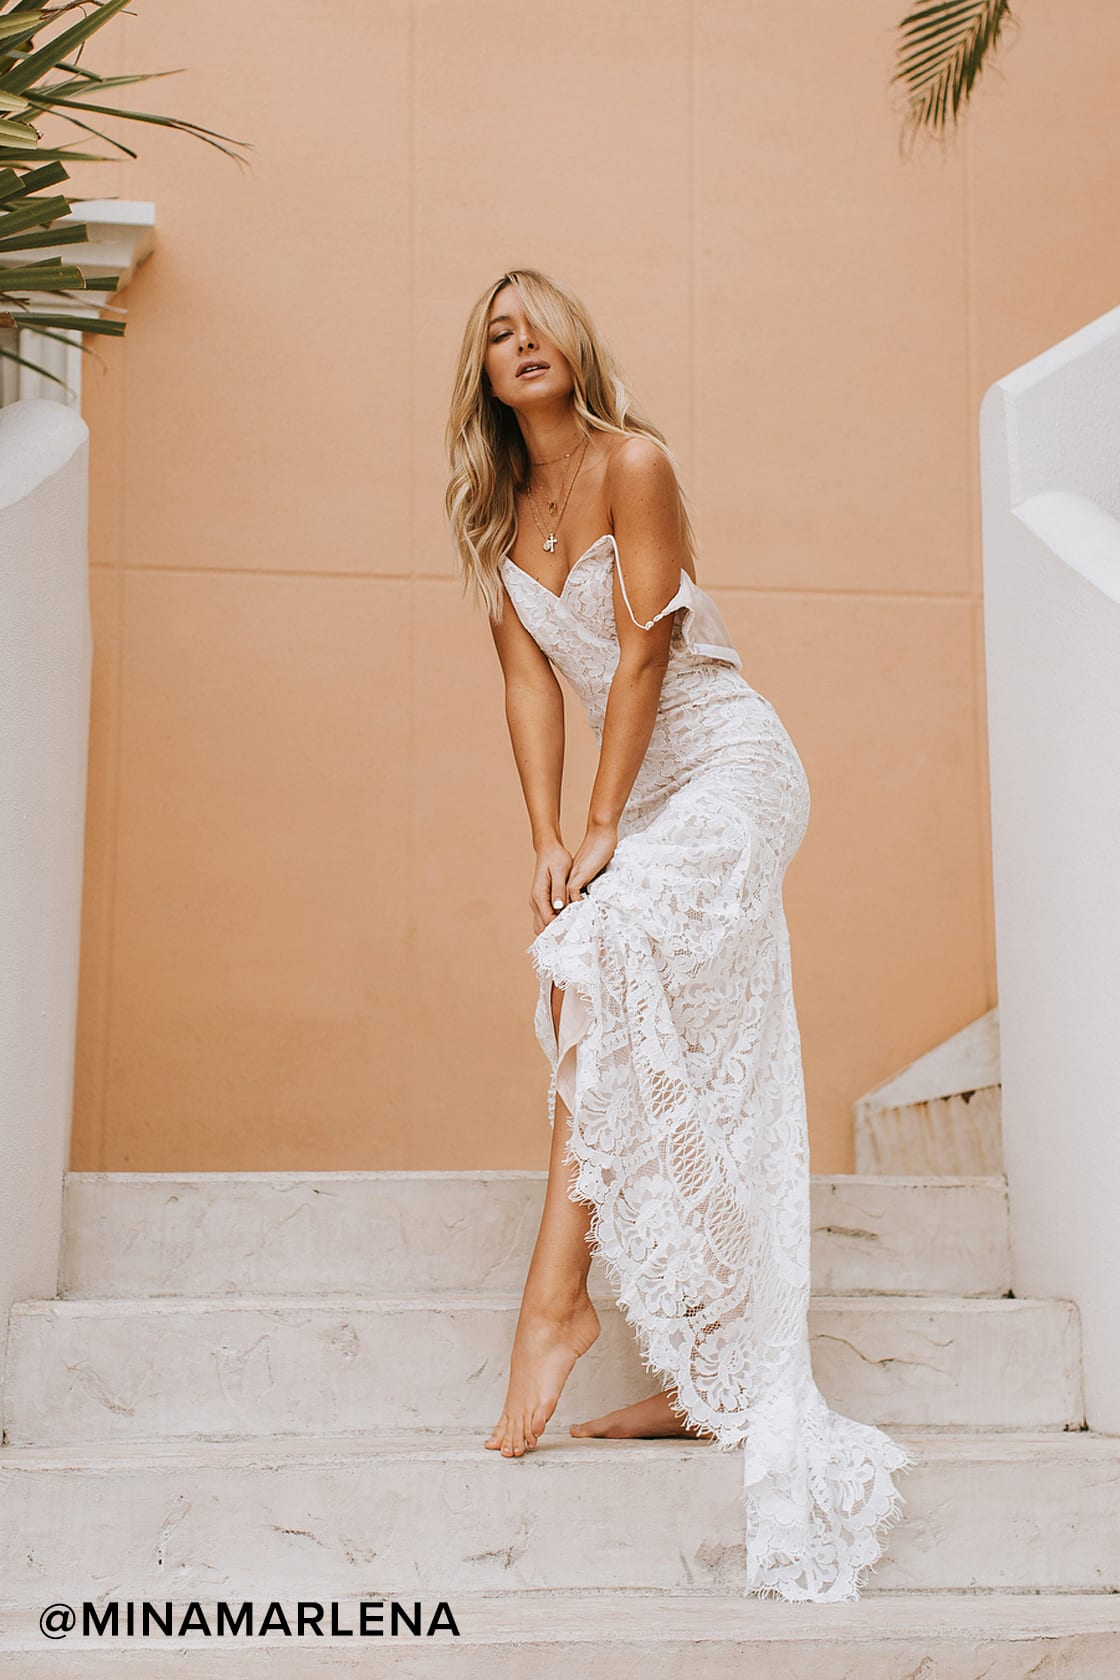 Affordable lace wedding dress under $100